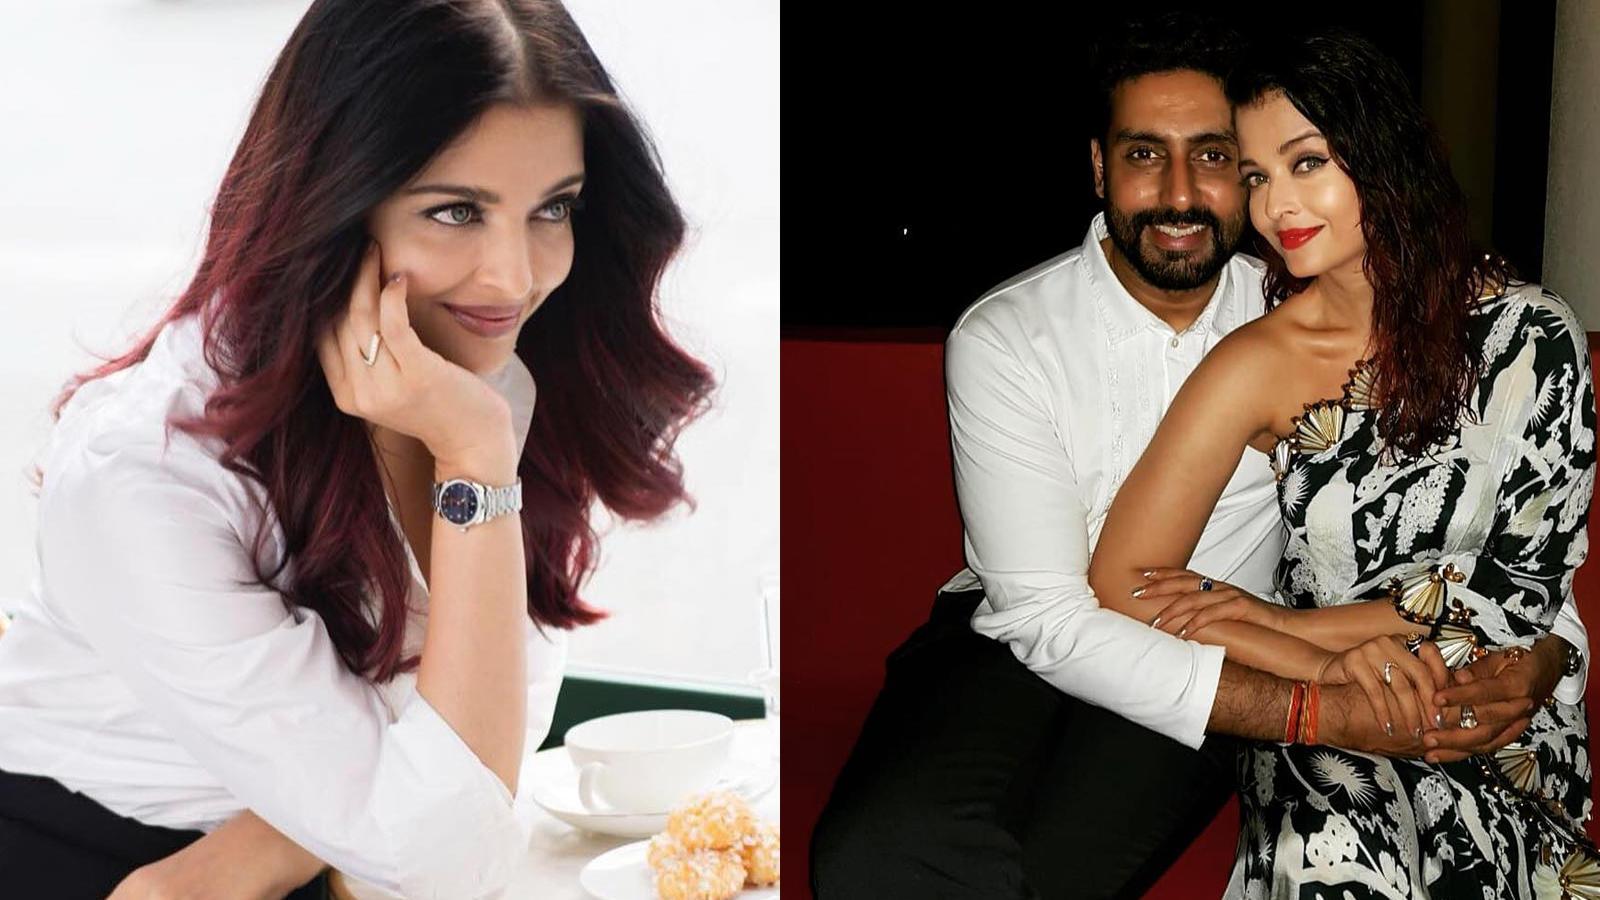 Aishwarya Rai Bachchan recalls how Abhishek Bachchan proposed to her    Hindi Movie News - Bollywood - Times of India